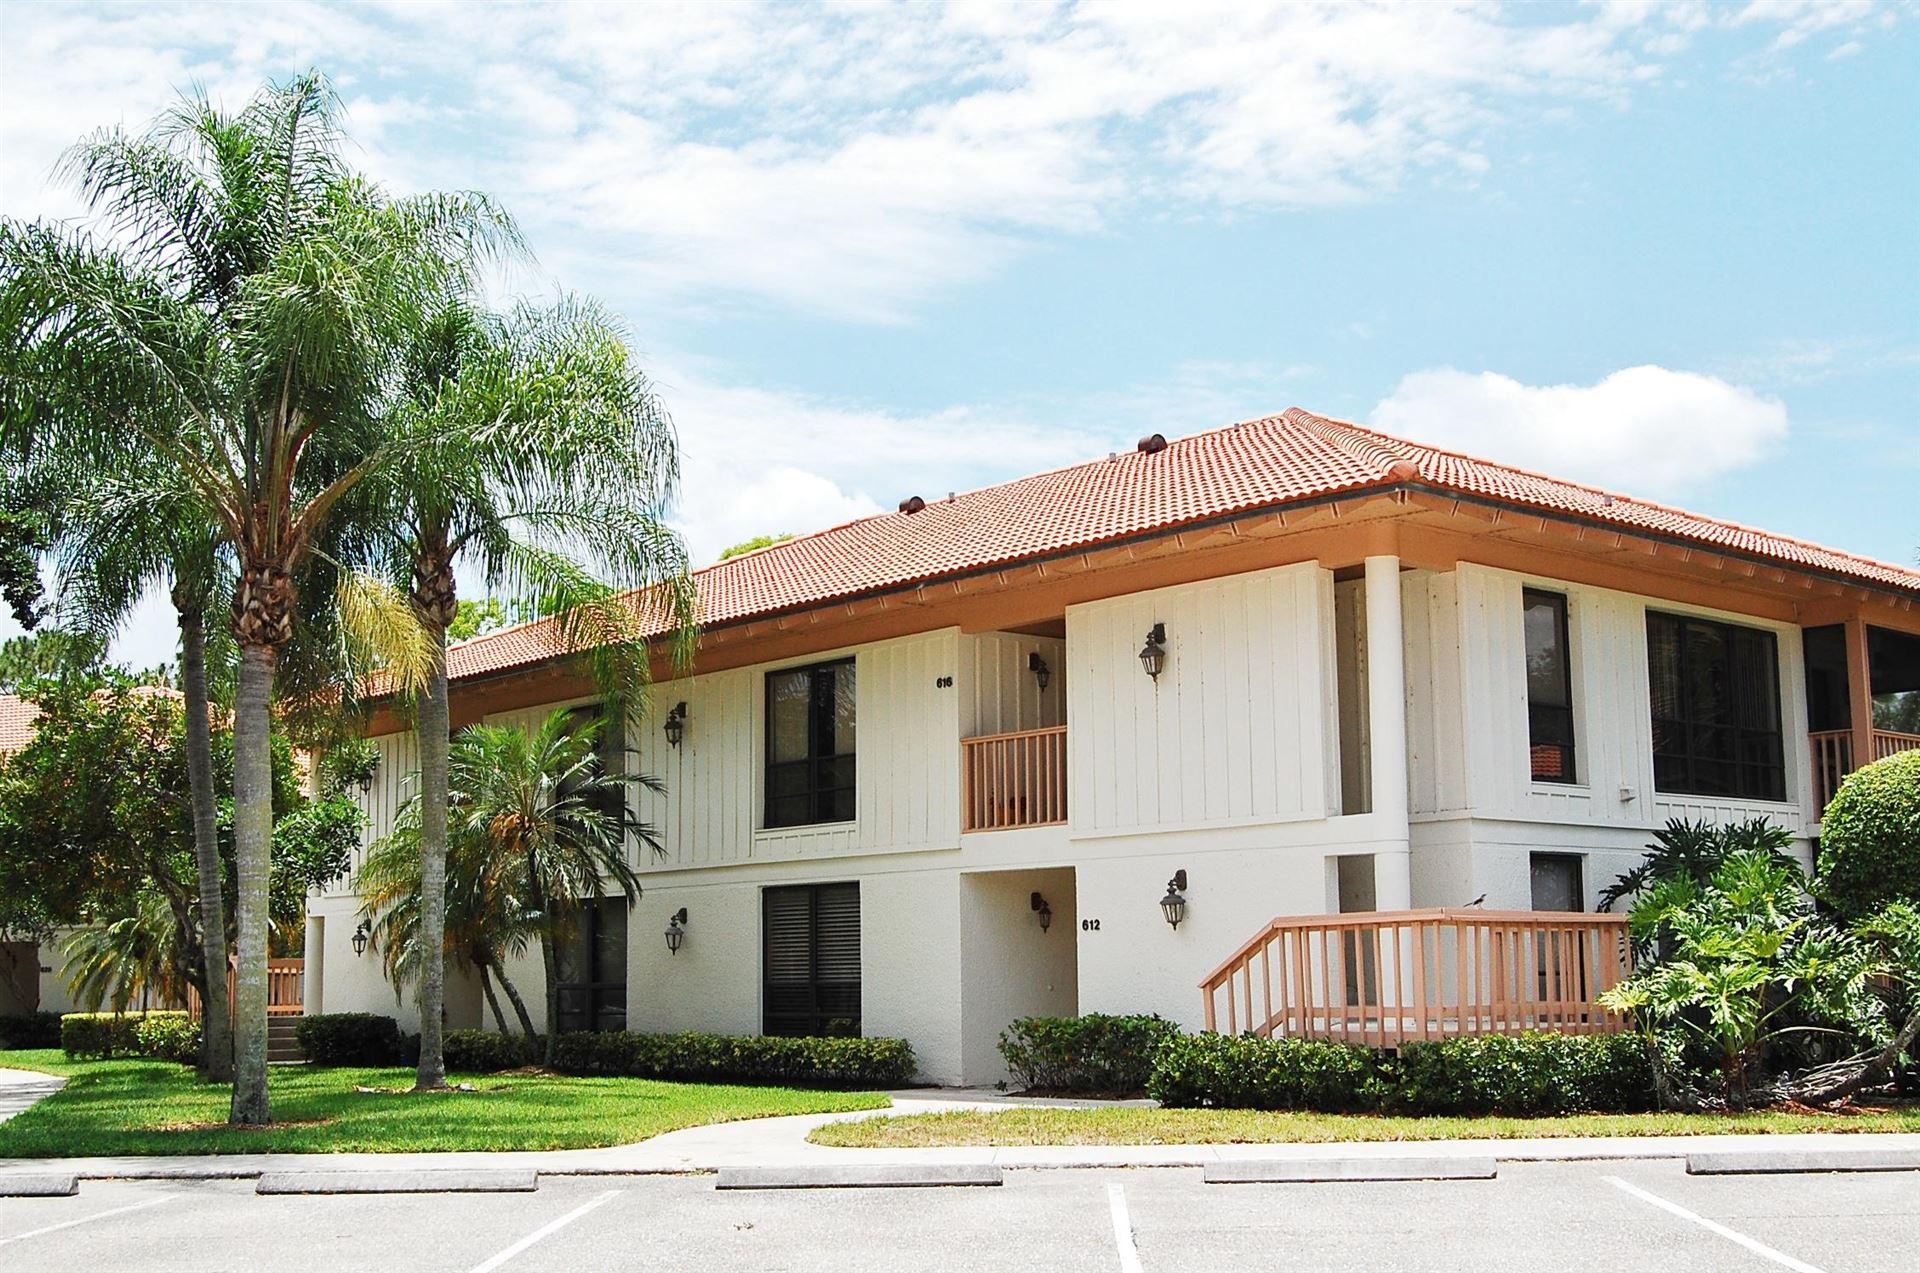 Photo of 612 Brackenwood Cove #612, Palm Beach Gardens, FL 33418 (MLS # RX-10662256)